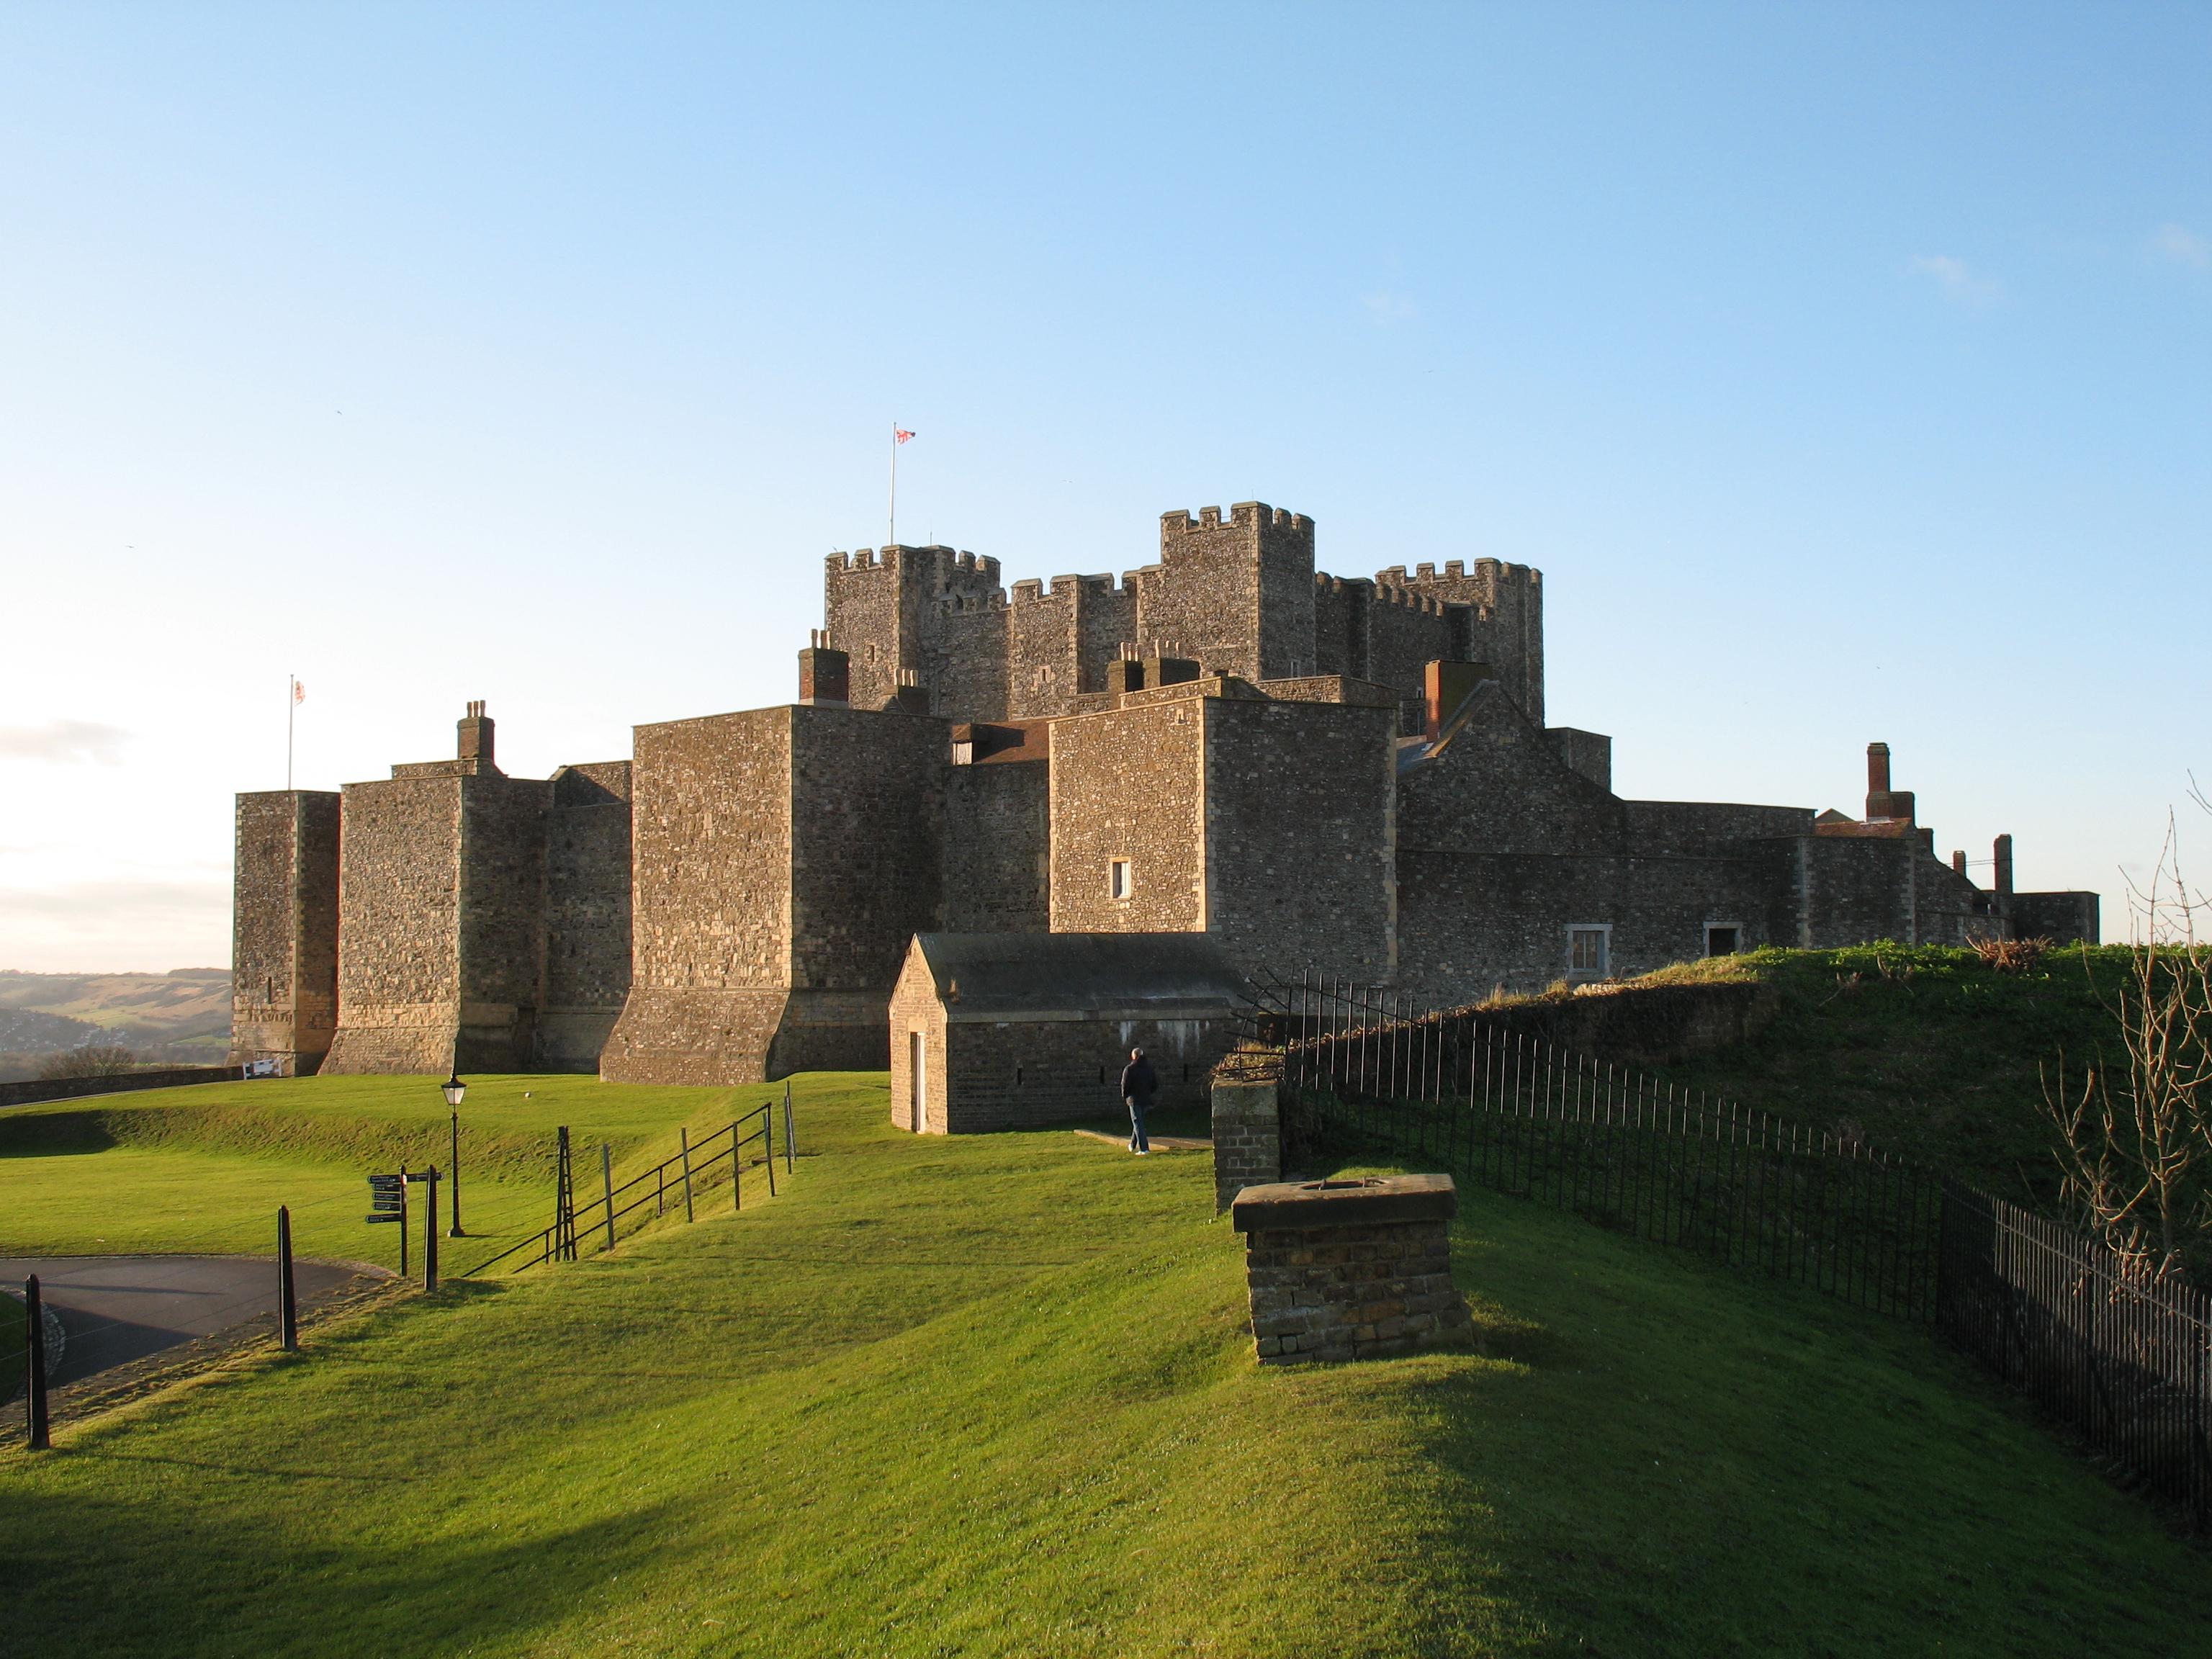 File:Dover Castle 05.jpg - Wikimedia Commons